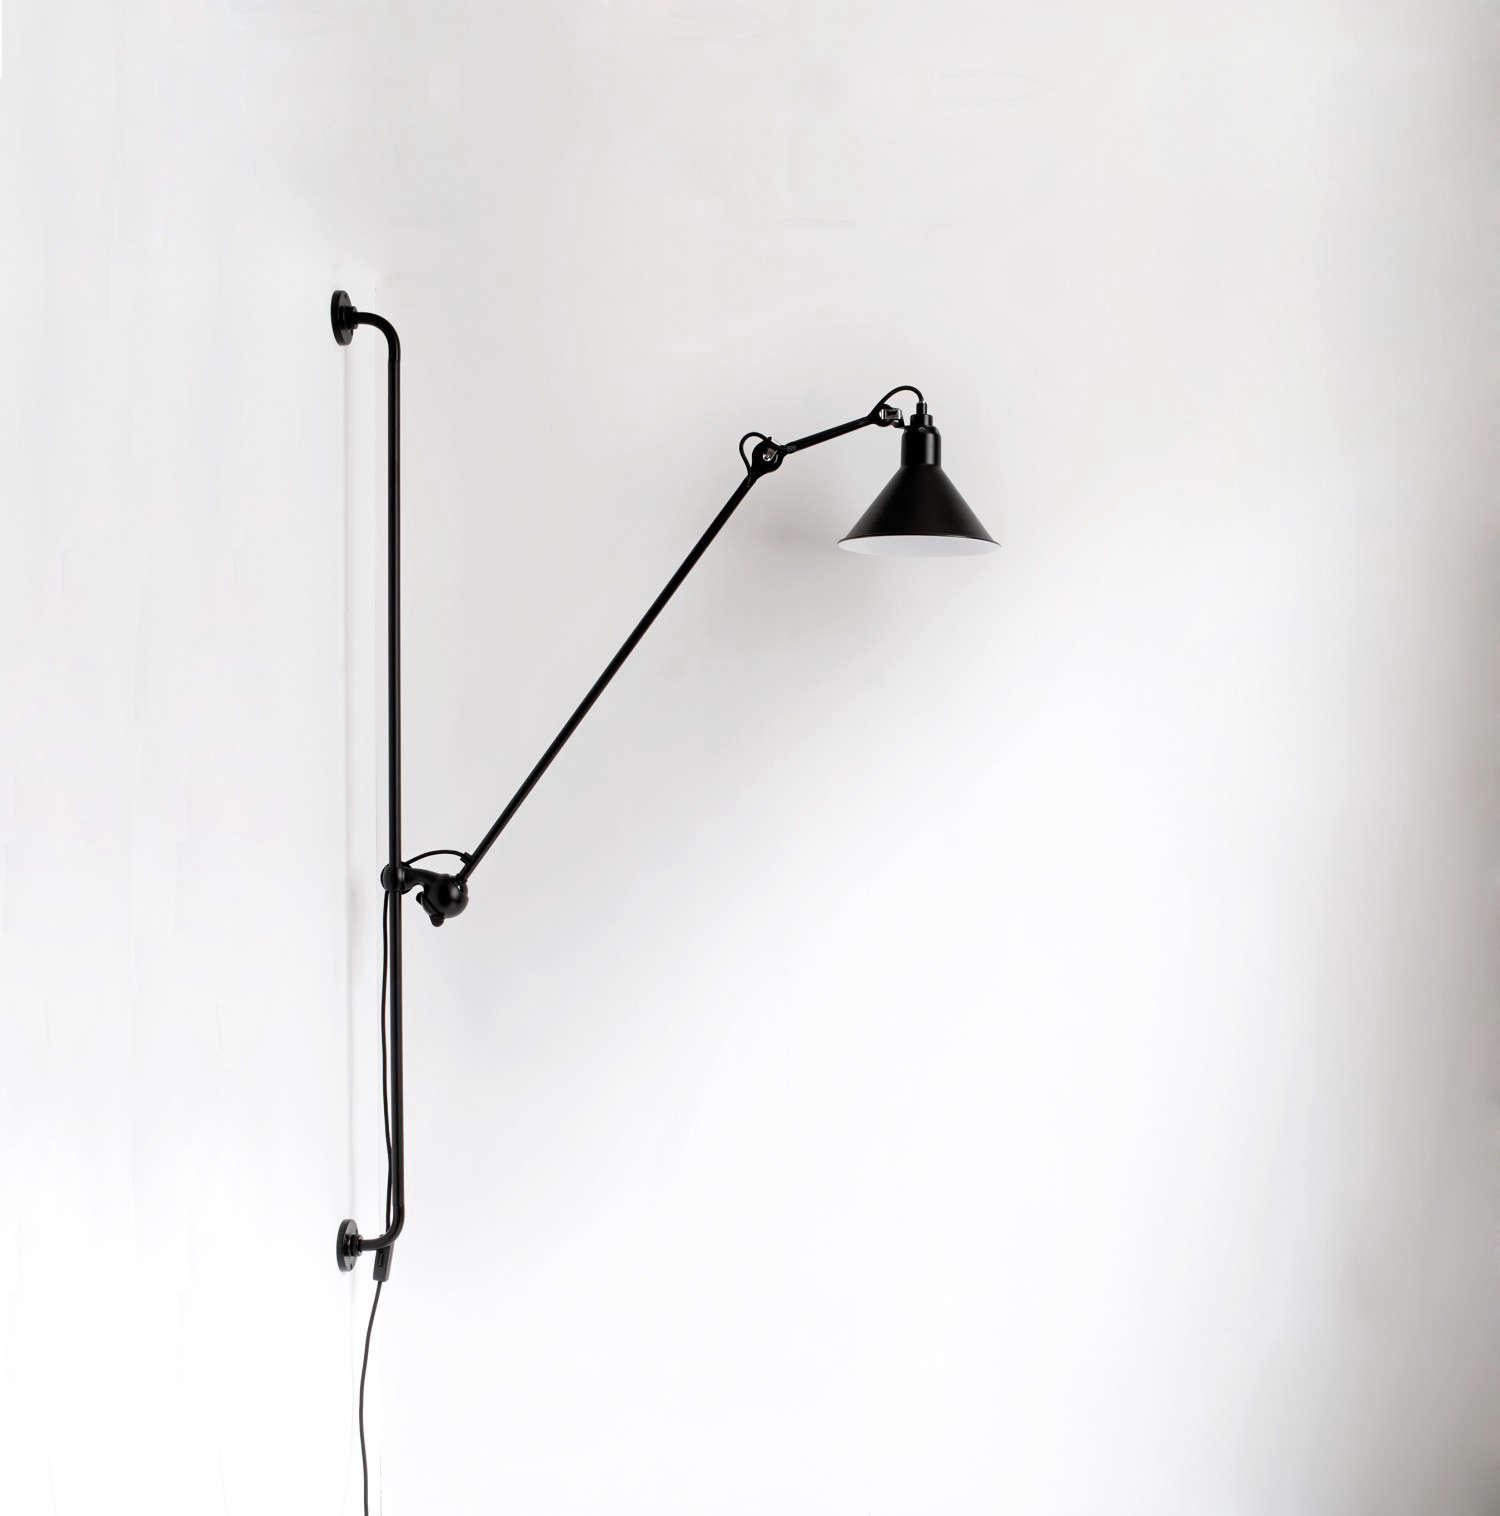 lampe gras wall lamp remodelista 2 10